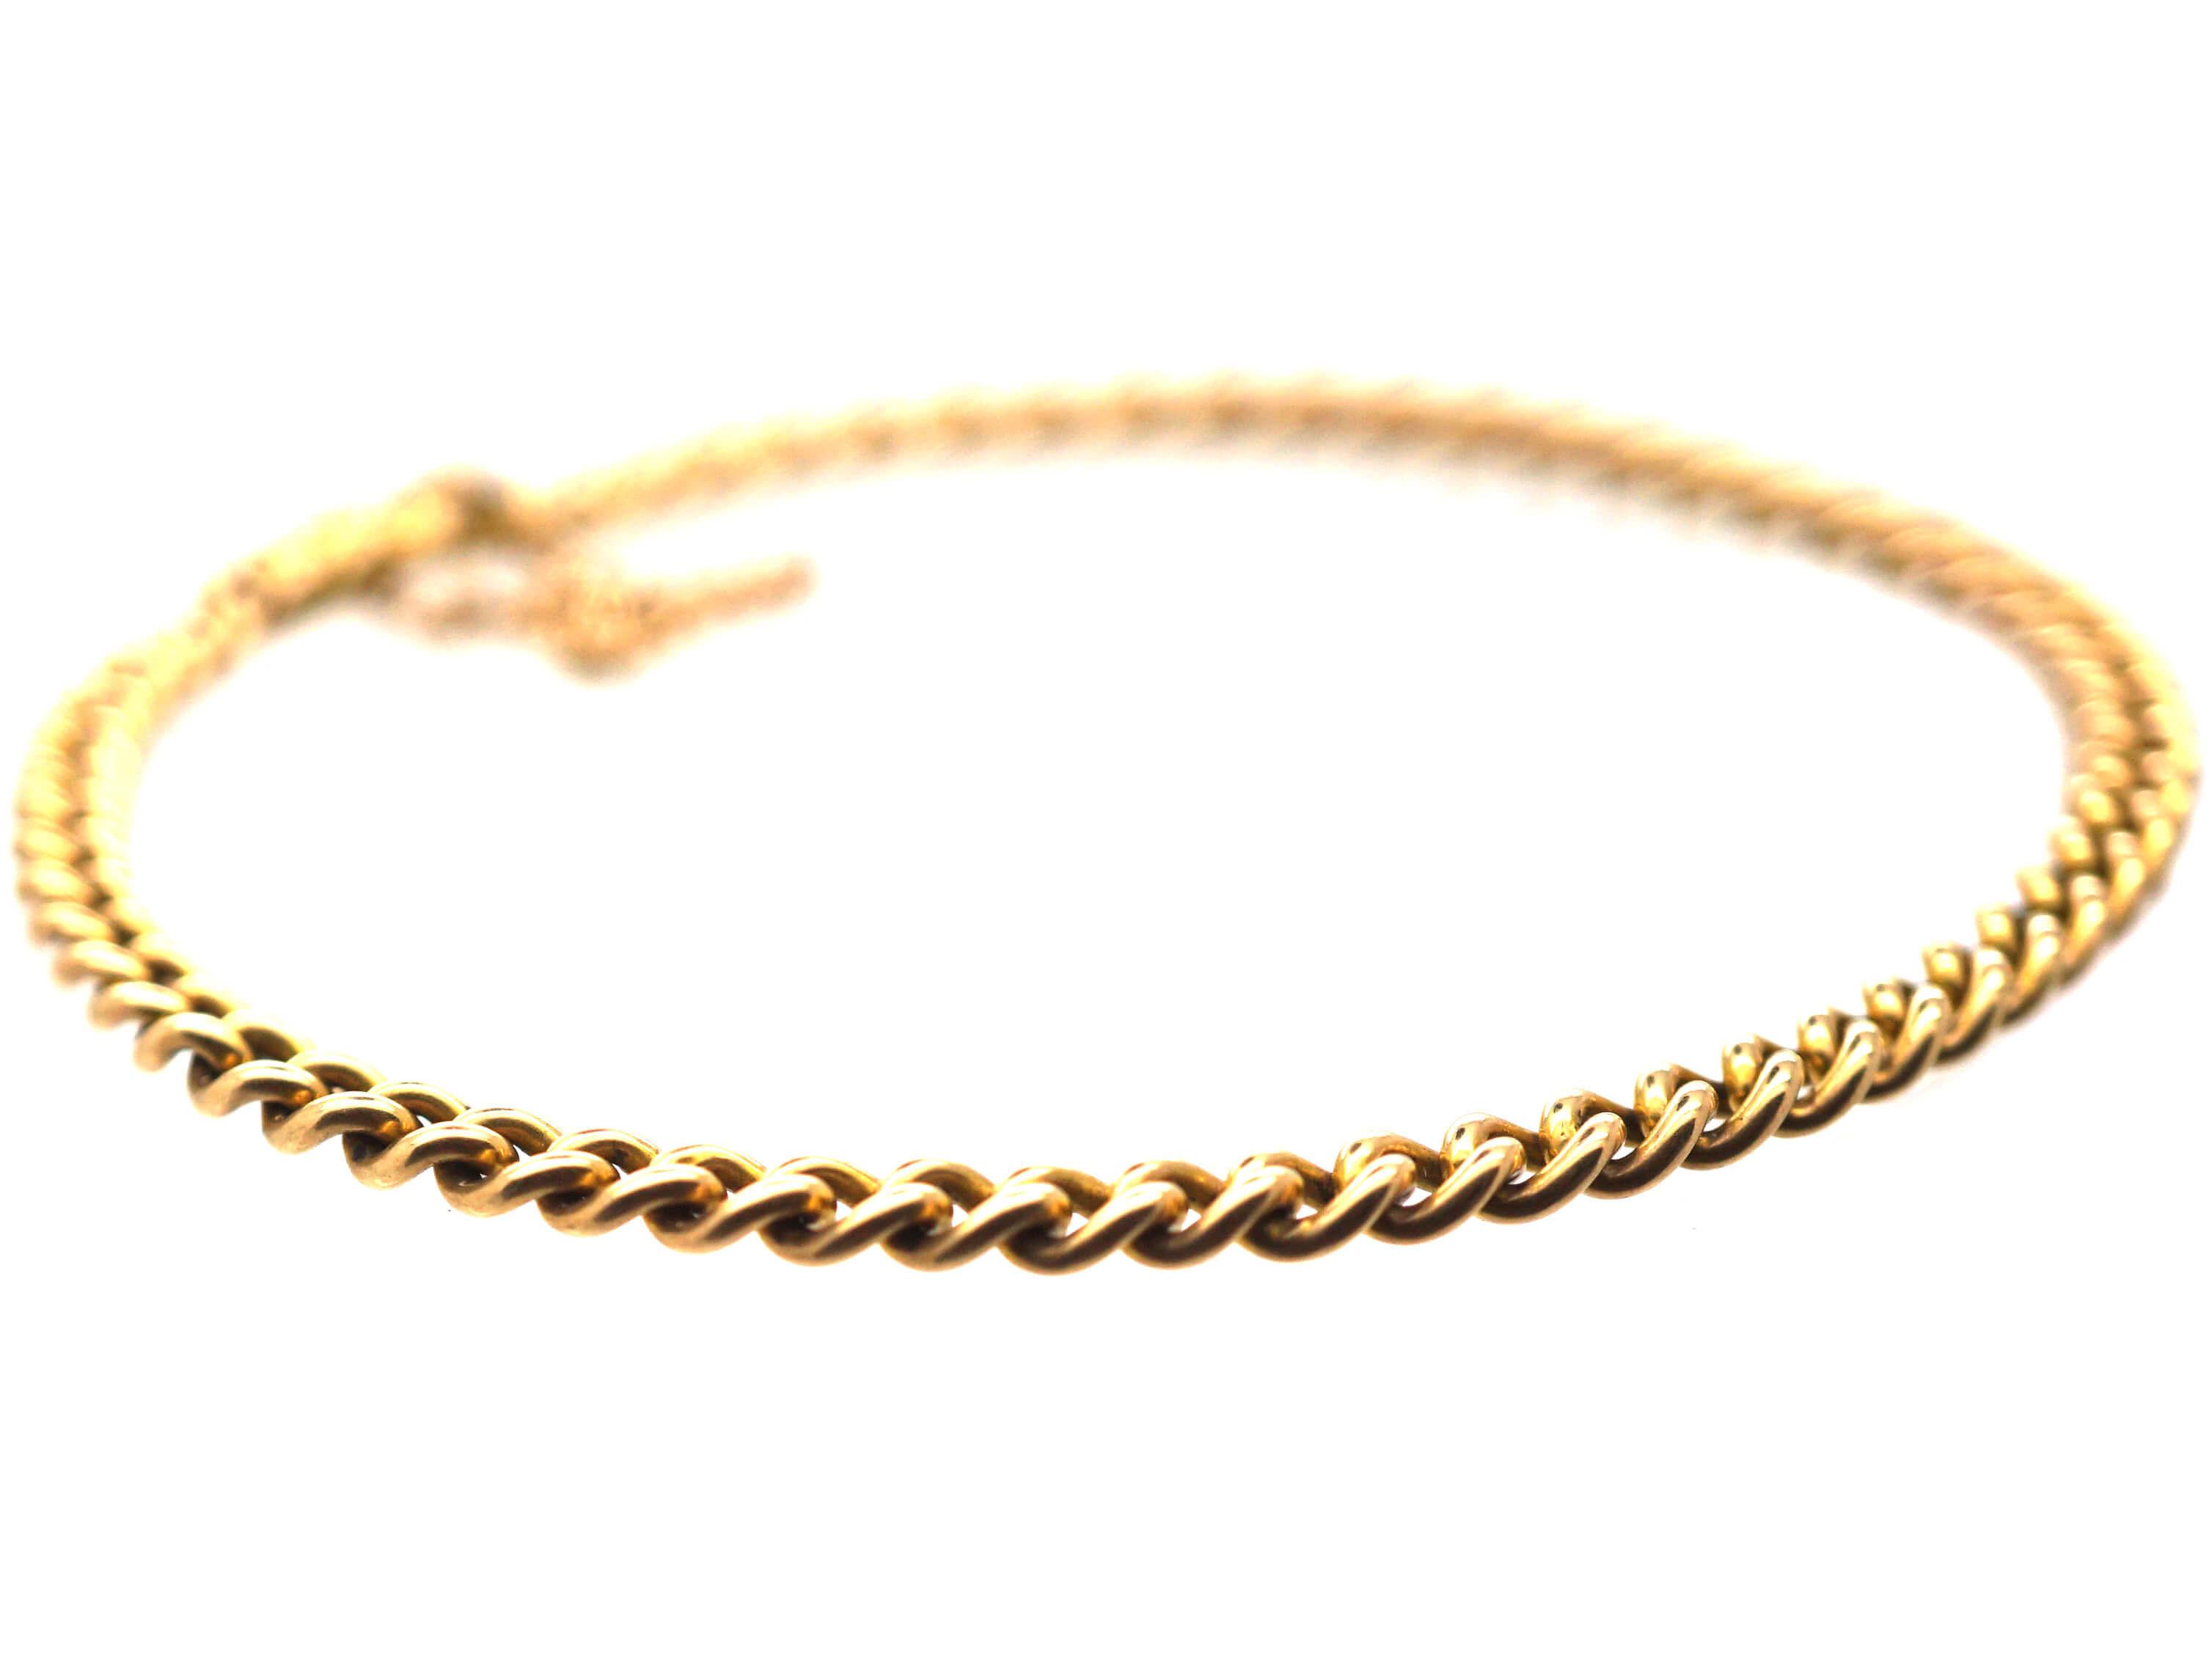 Edwardian 15ct Gold Woven Curb Design Narrow Bracelet